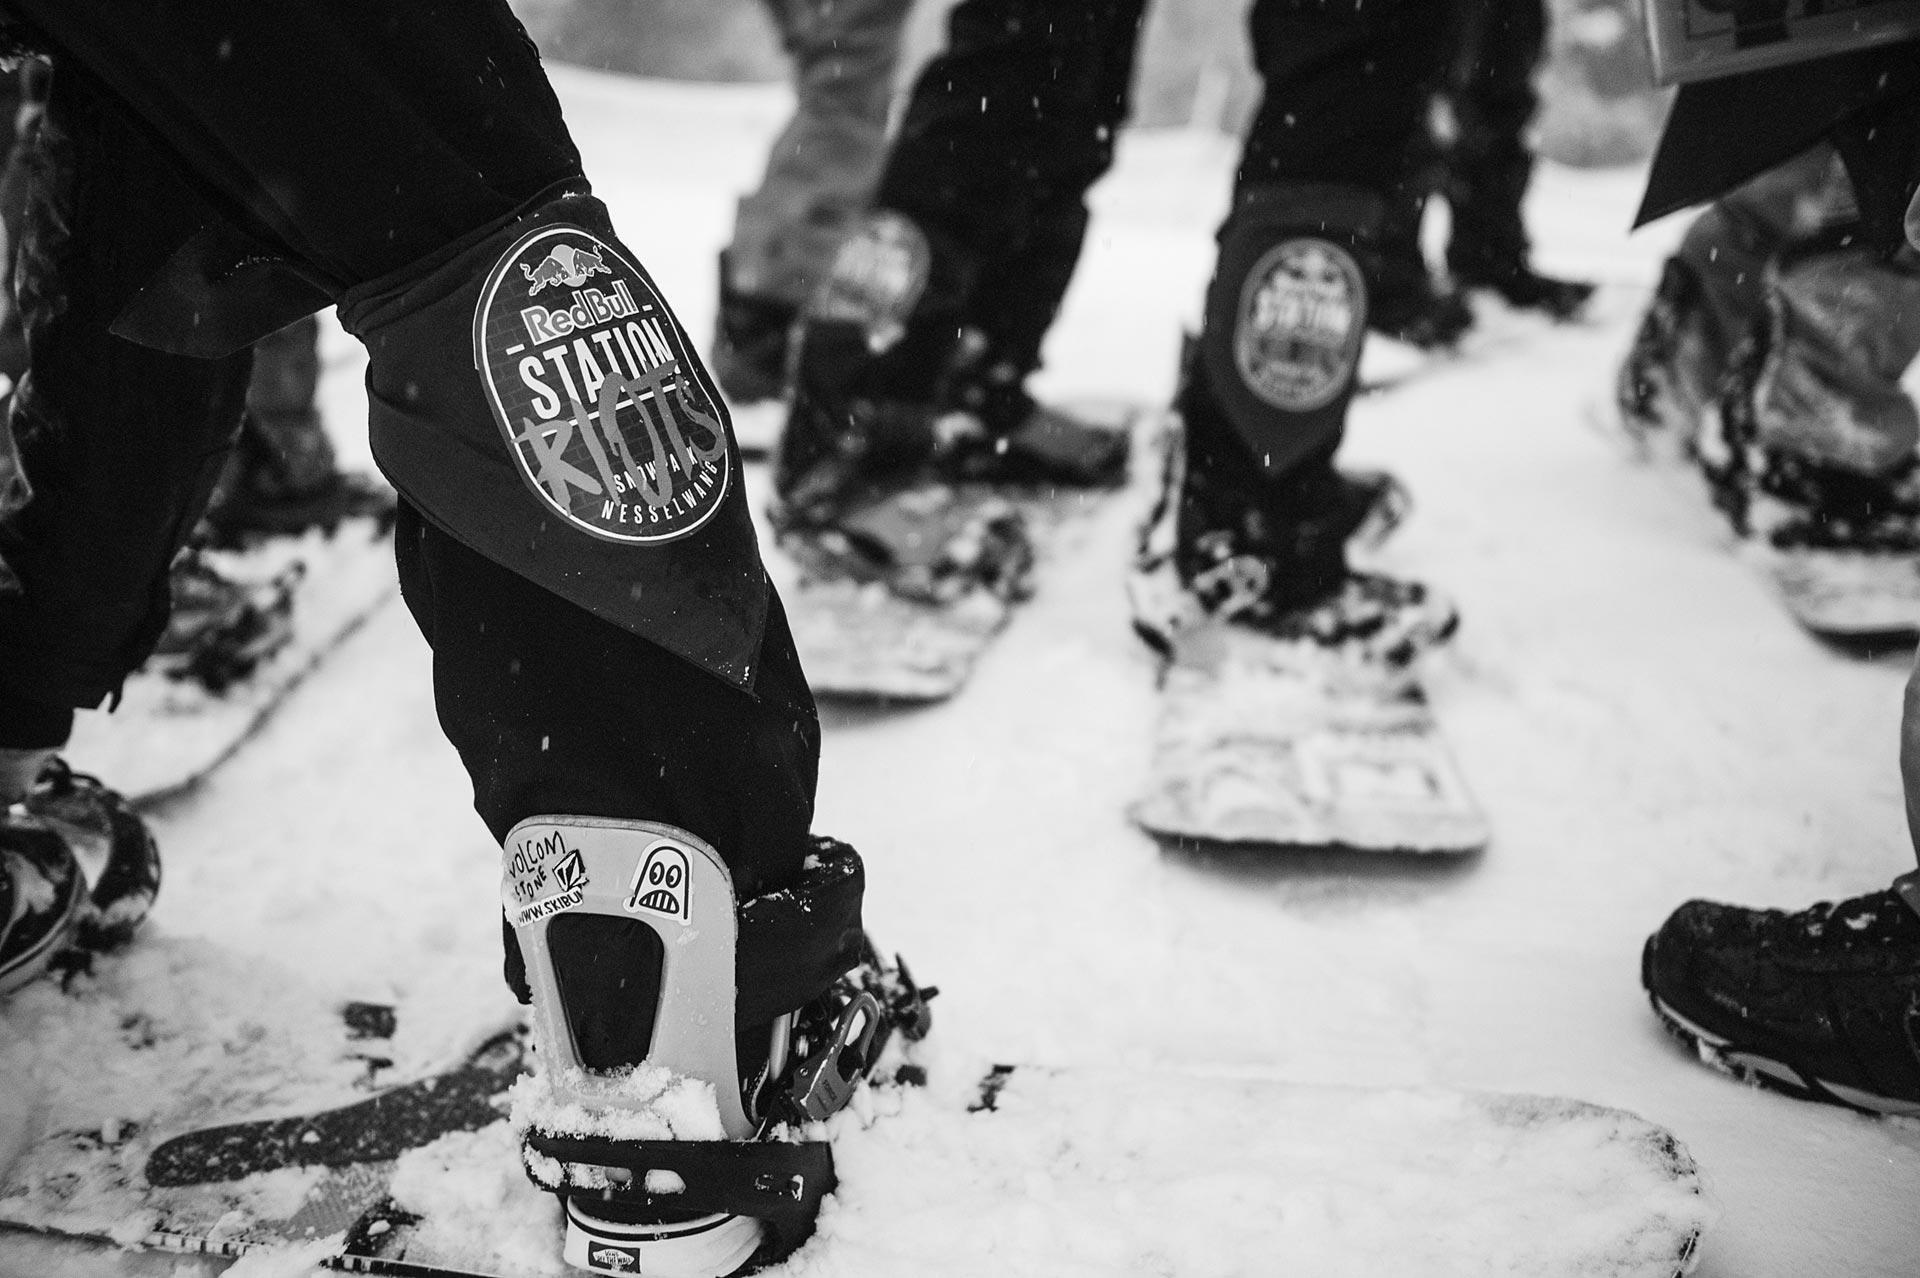 Snowboard-Elite trifft sich im Allgäu - Red Bull Station Riots in Nesselwang